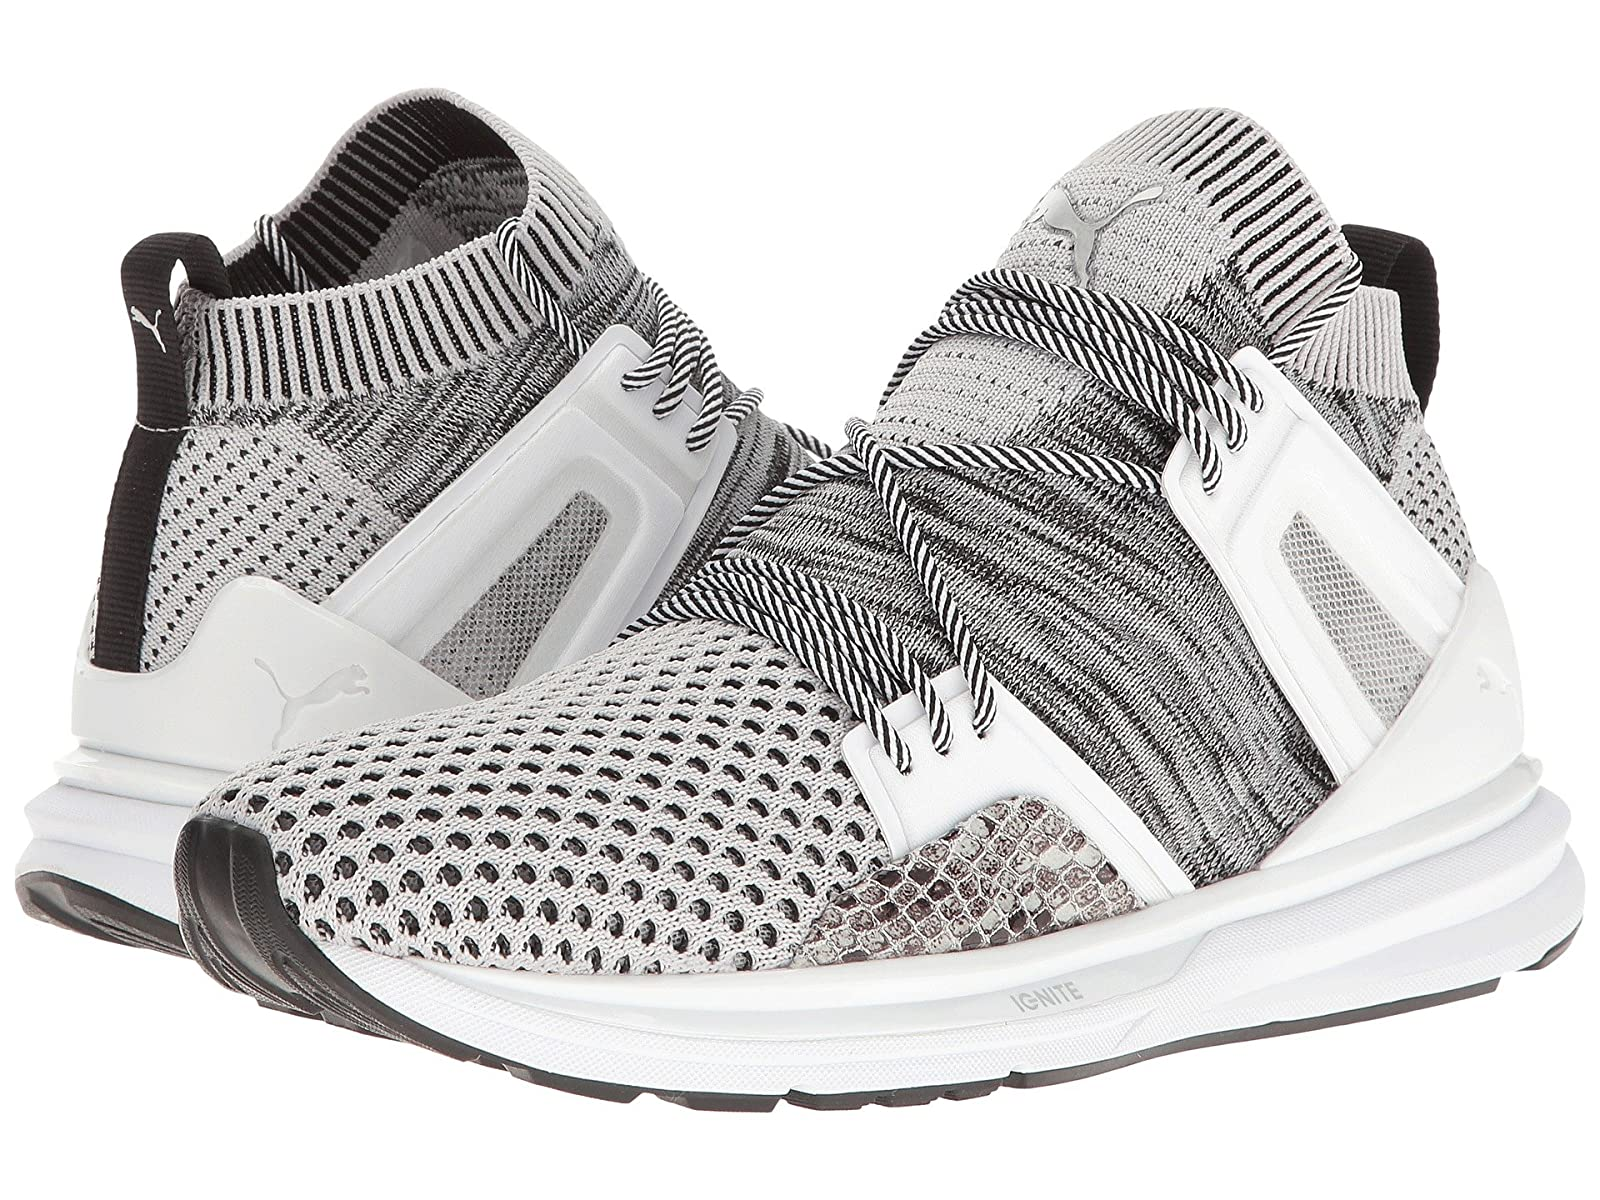 PUMA B.O.G Limitless Hi AnimalCheap and distinctive eye-catching shoes